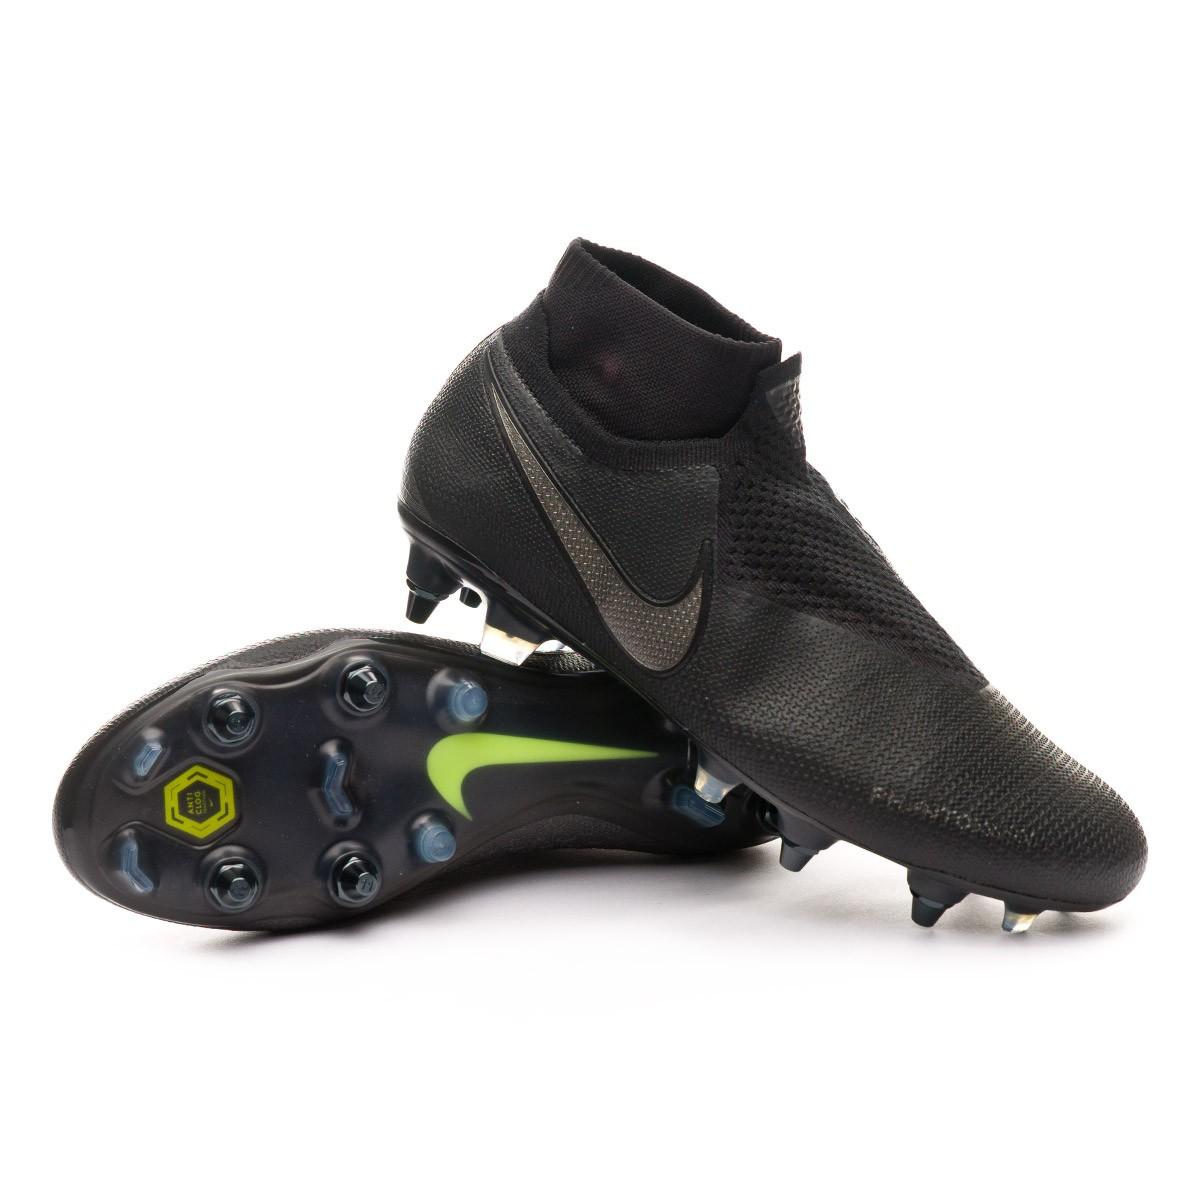 39a3a24d1d4 Nike Phantom Vision Elite DF SG-Pro AC Football Boots. Black reference no.